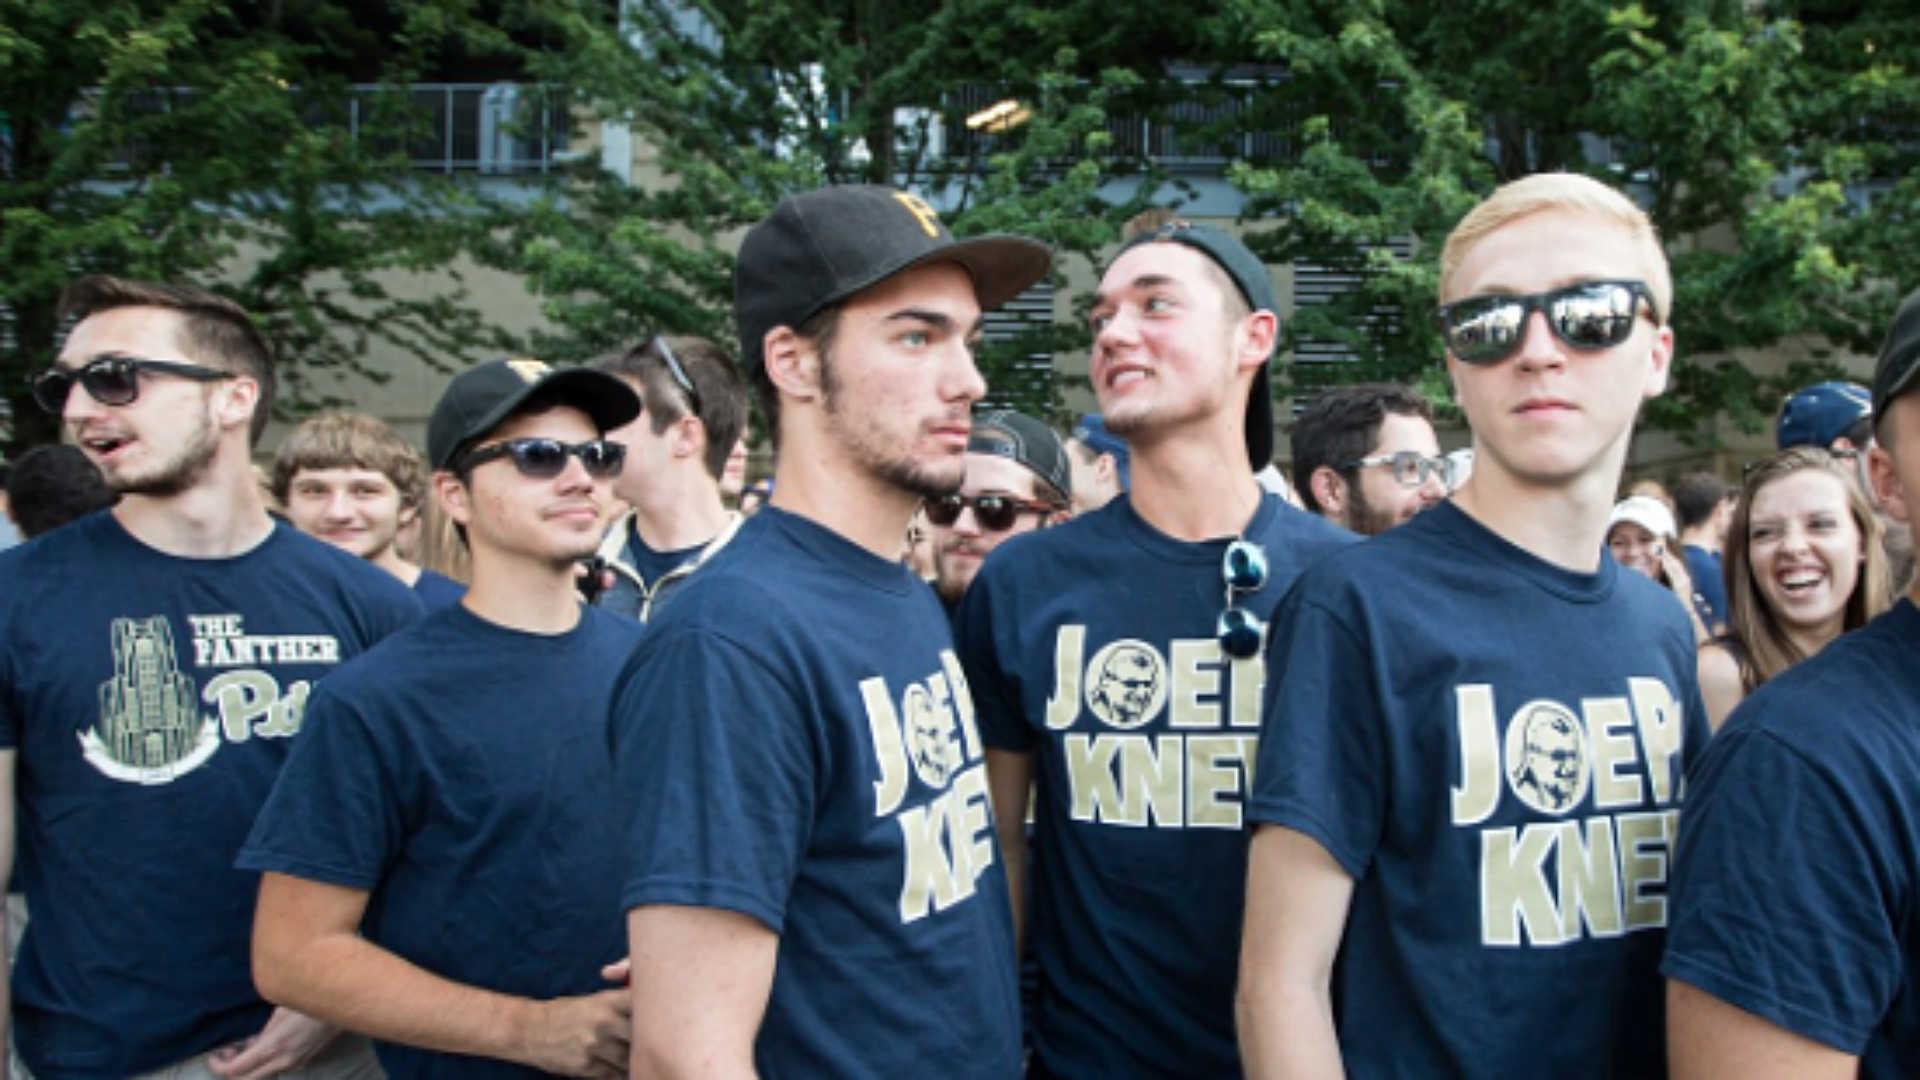 Image result for joe knew t shirt